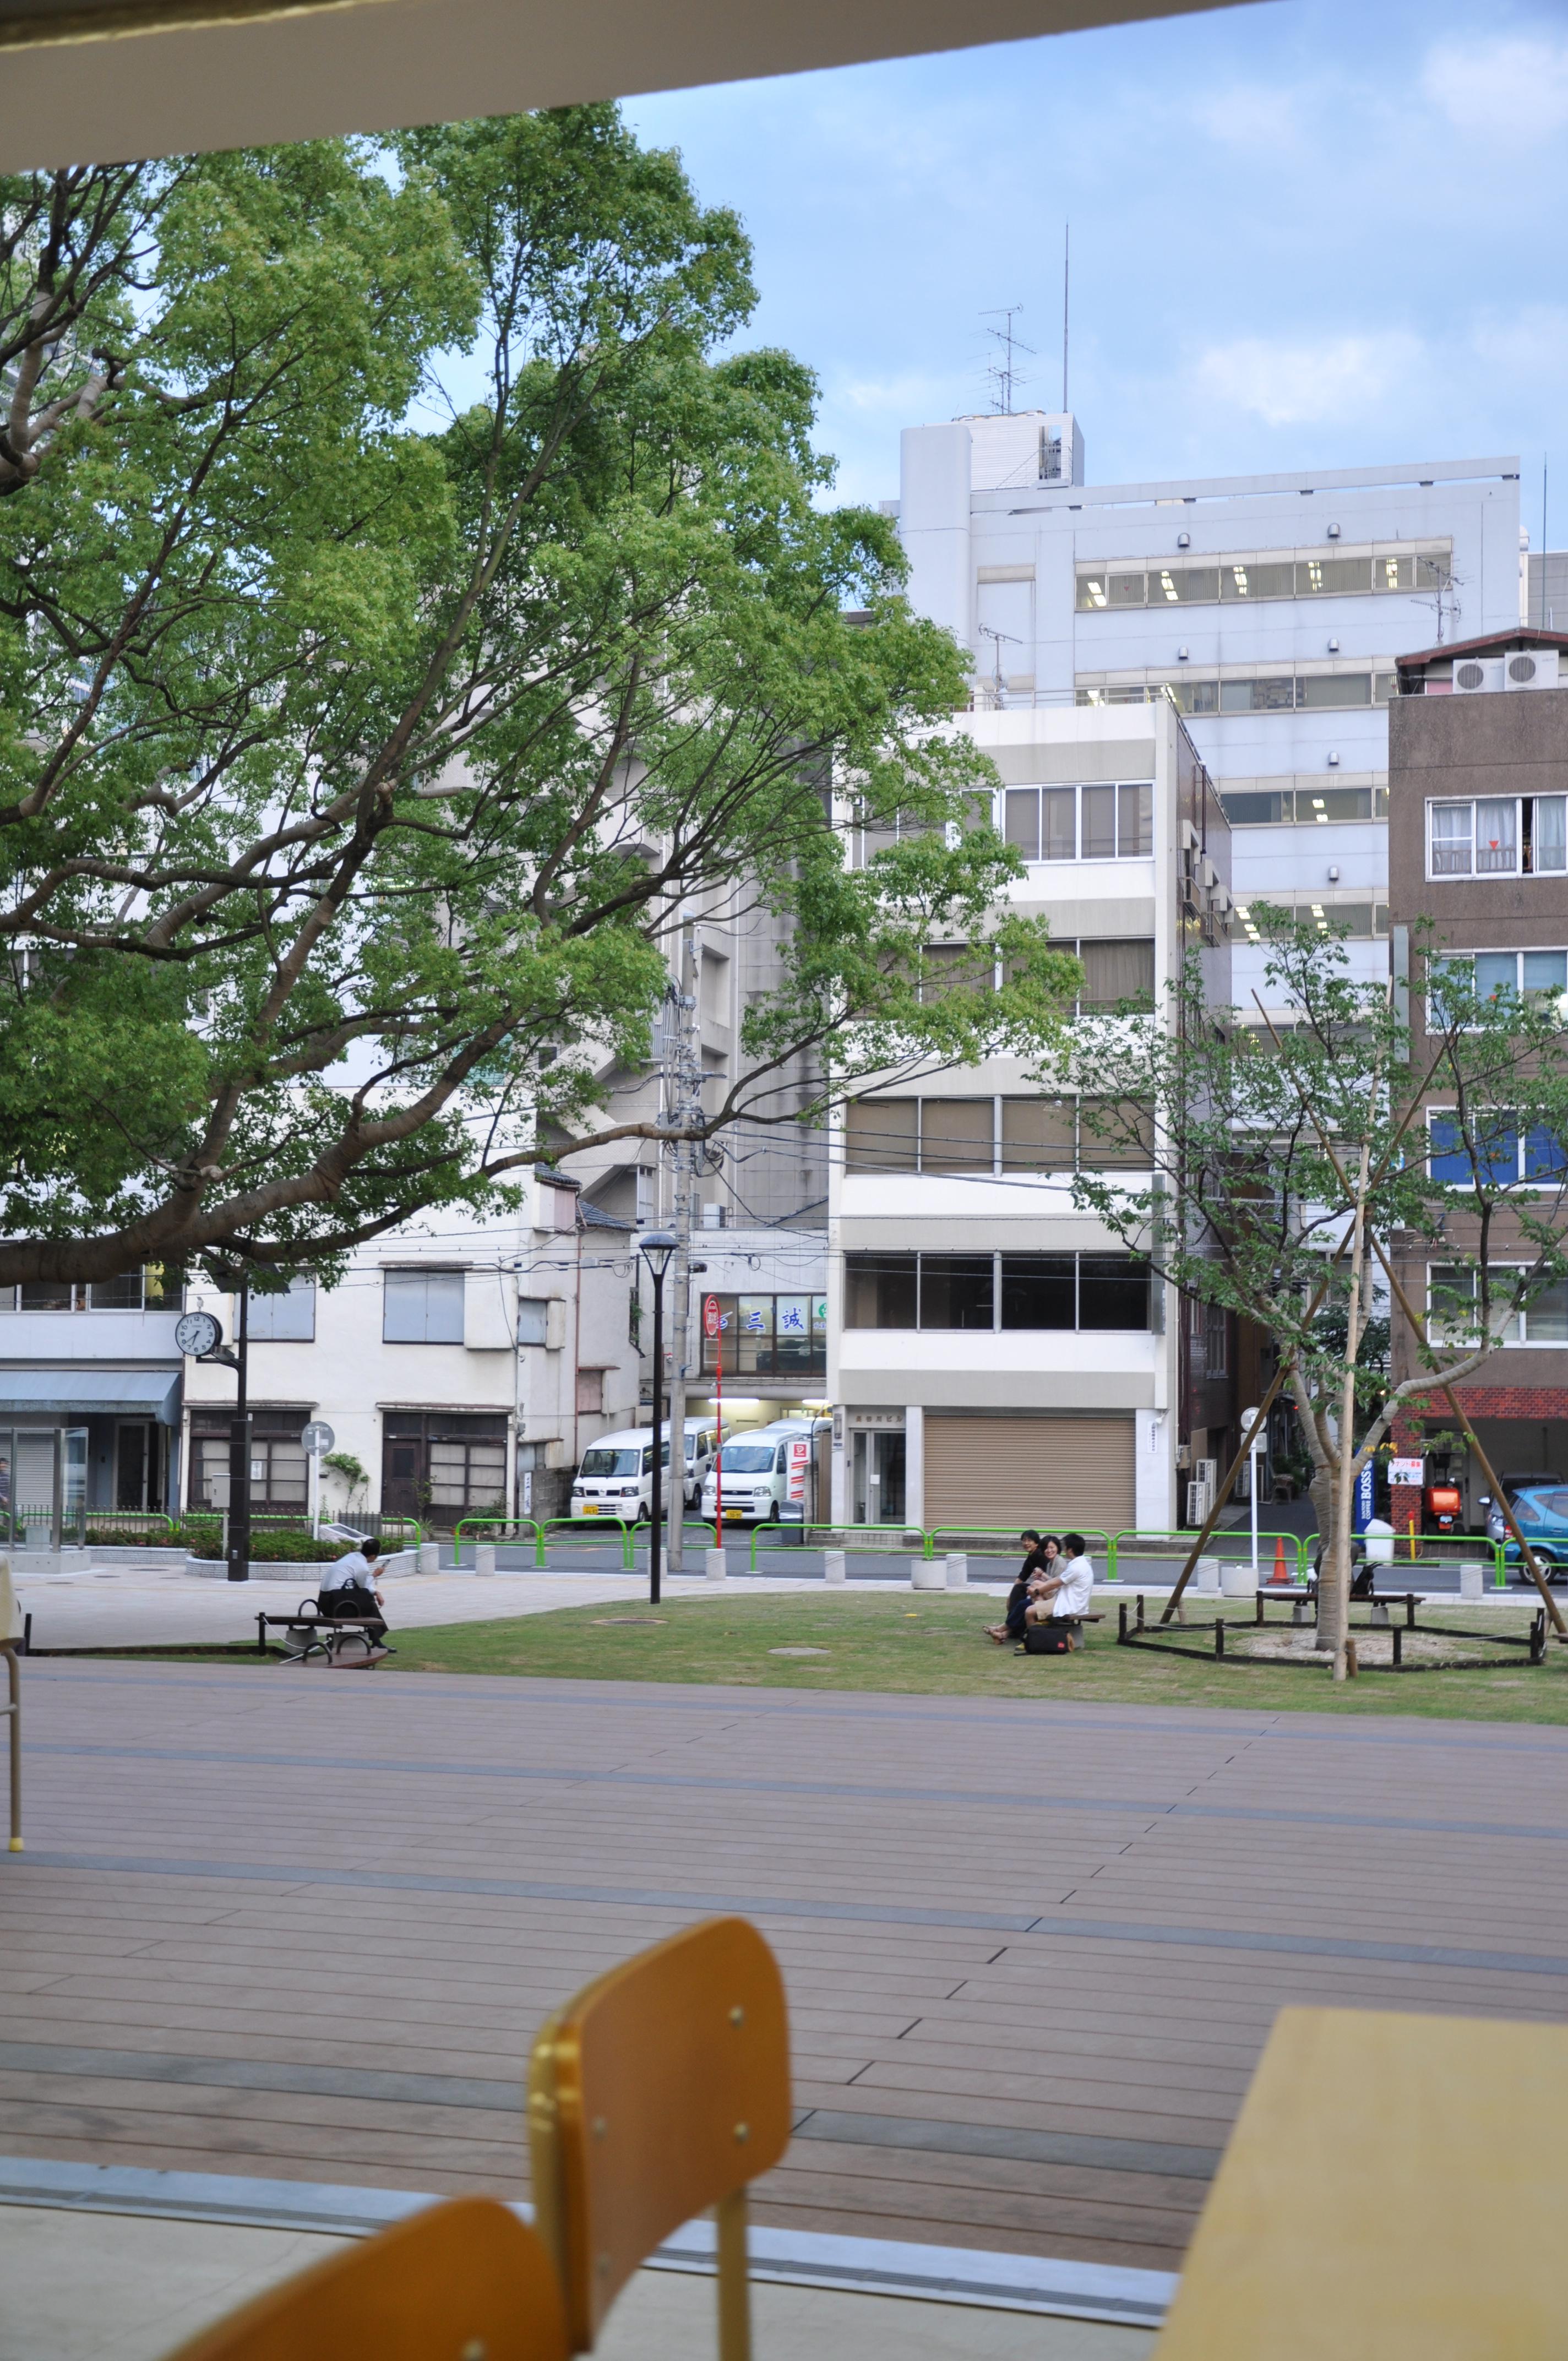 http://blog.3331.jp/staff/file/%E7%B8%A6.jpg